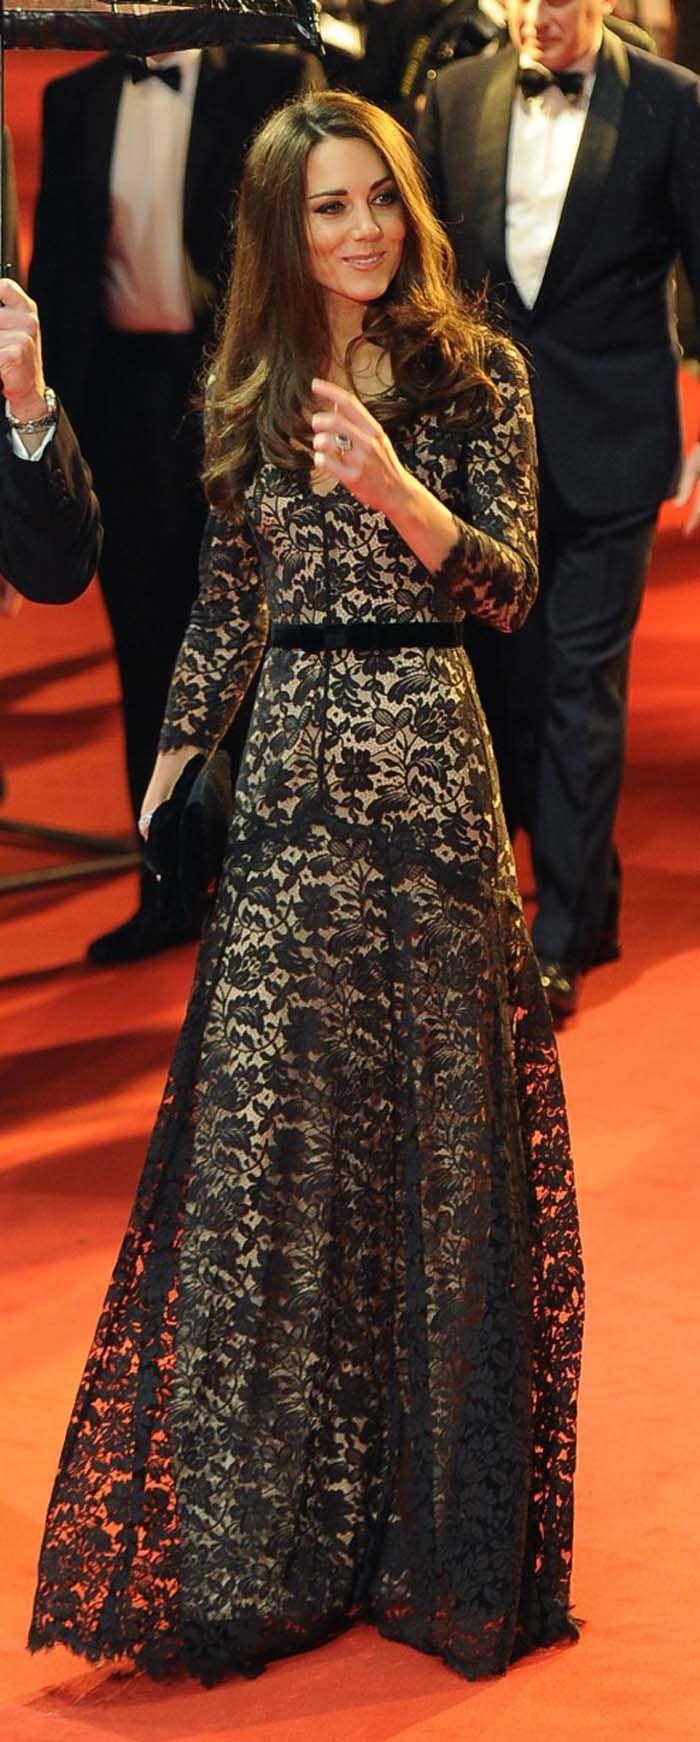 Lace dress kate middleton  Kate Middleton in Alice Temperley Lace Dress  lace  Pinterest